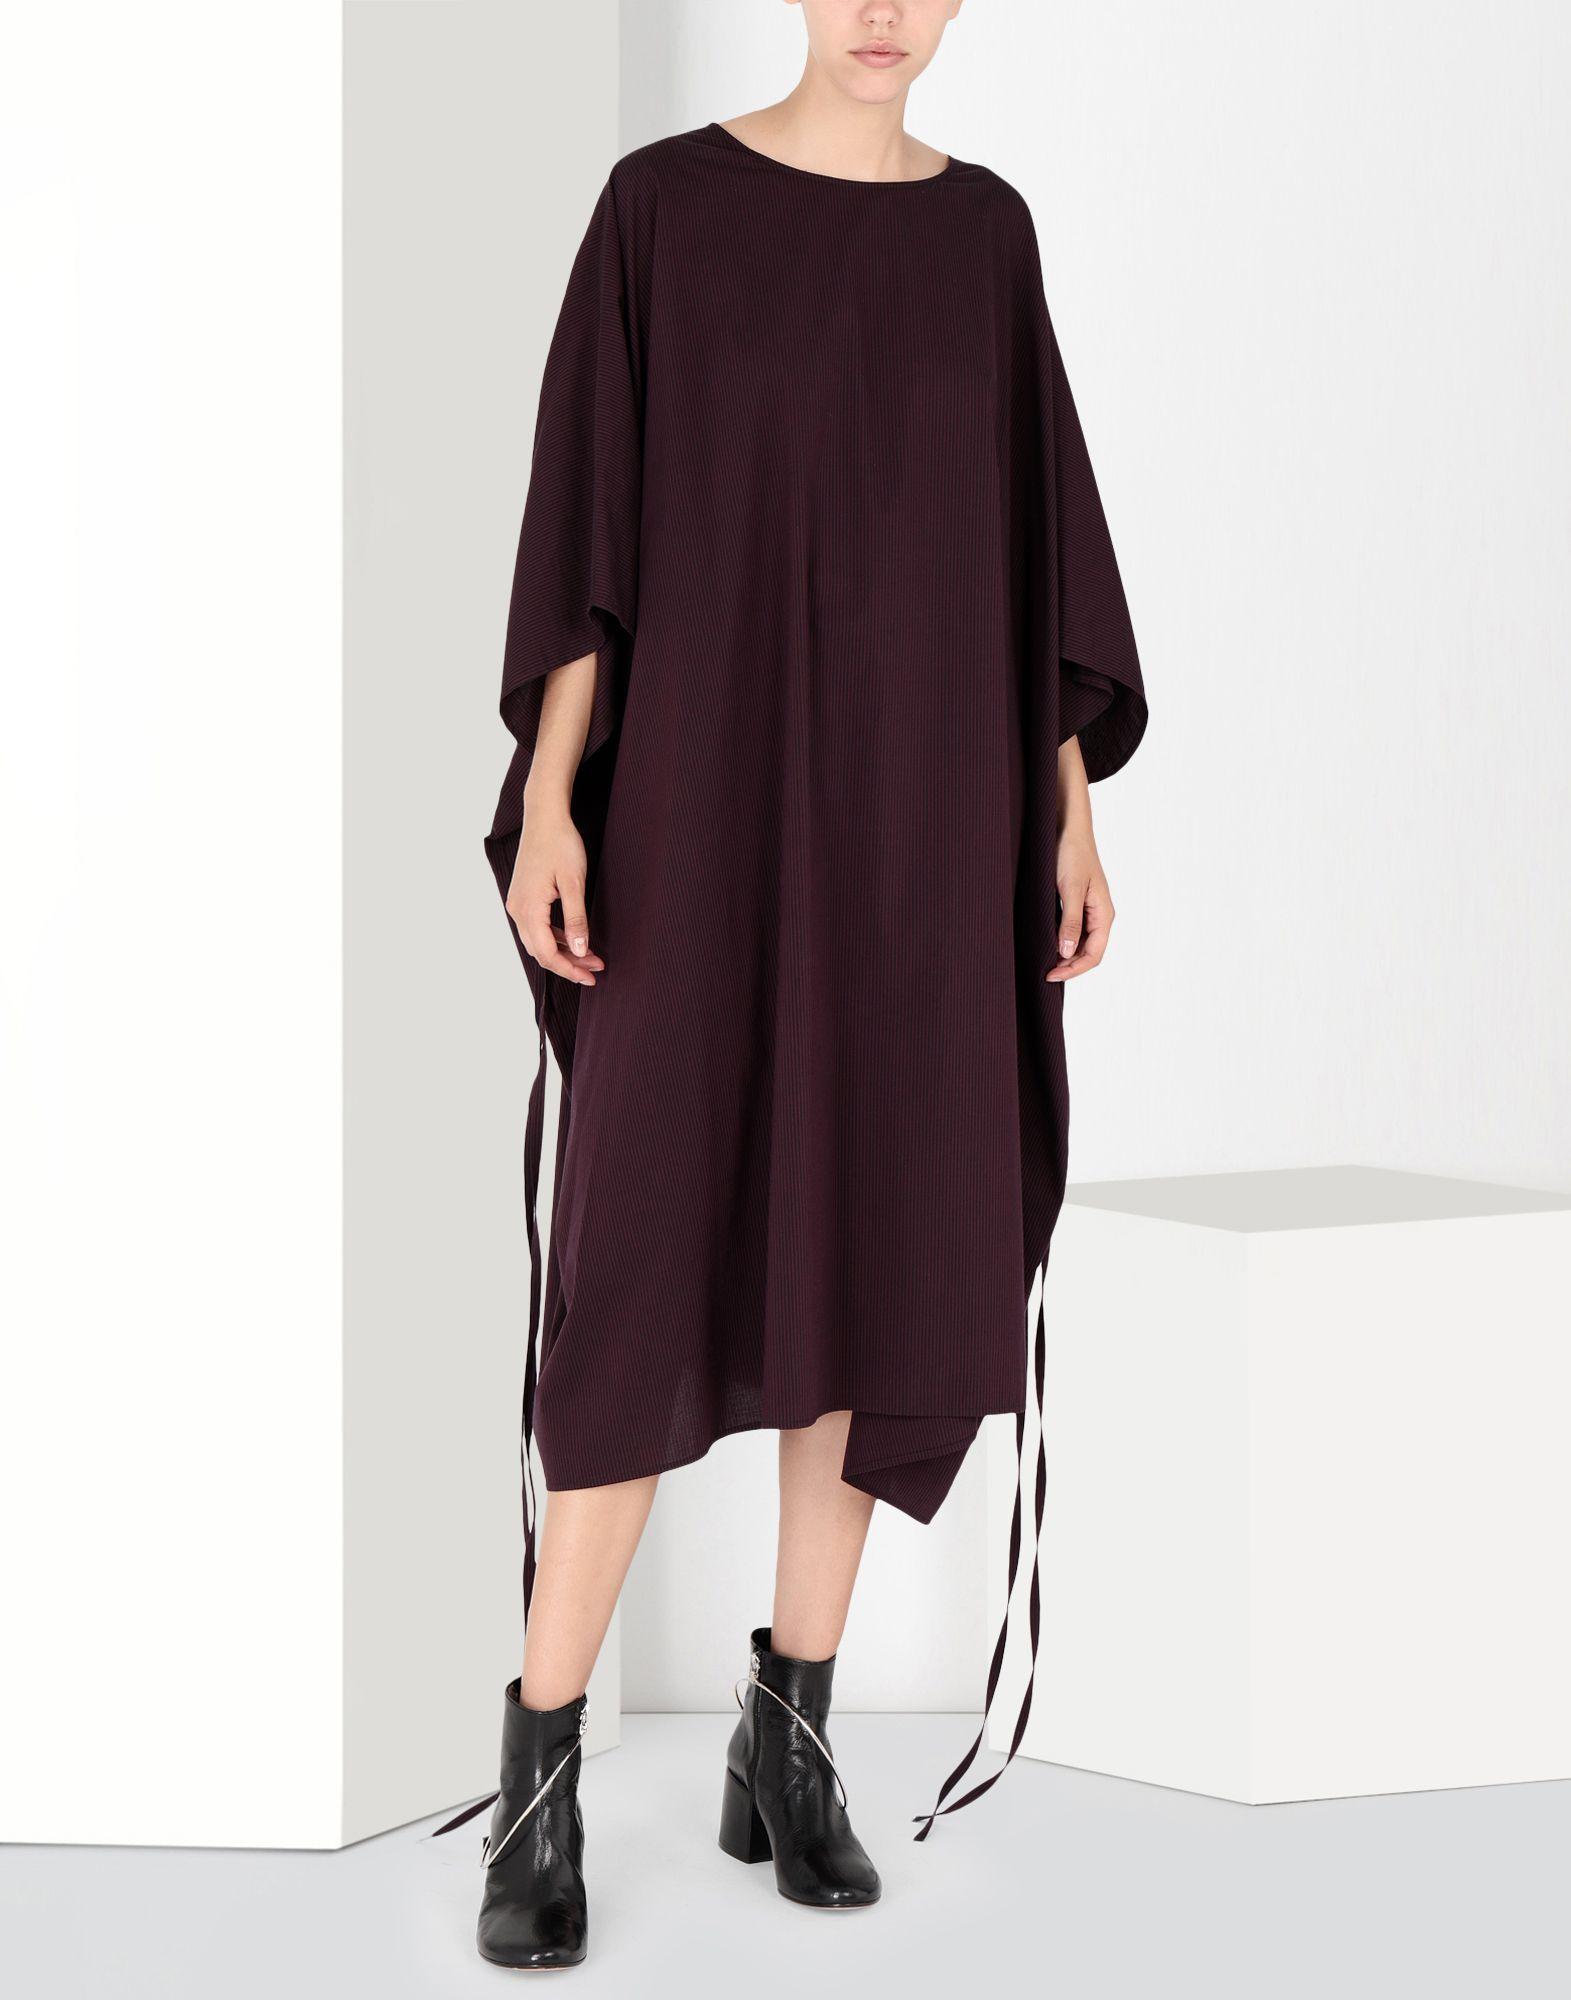 MM6 MAISON MARGIELA Flat cotton dress 3/4 length dress Woman f